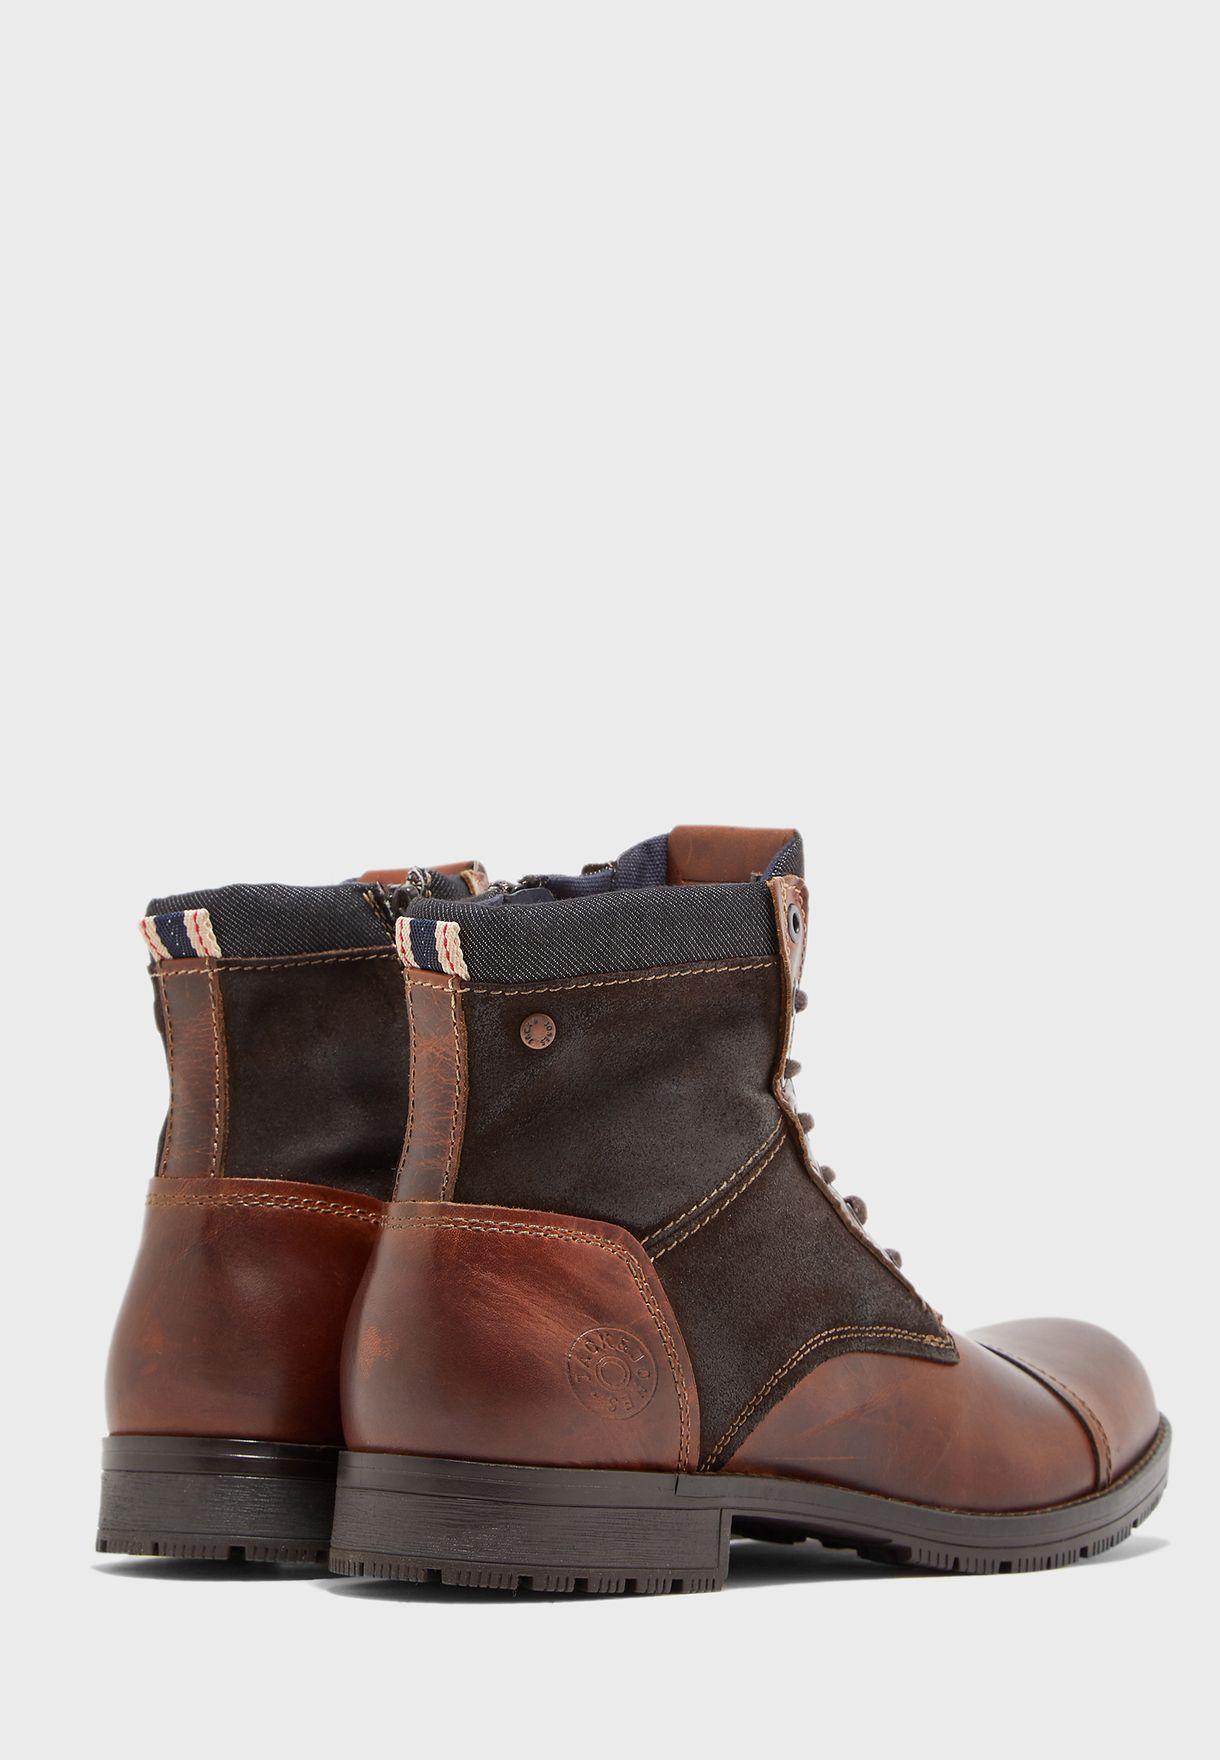 Marshall Boots